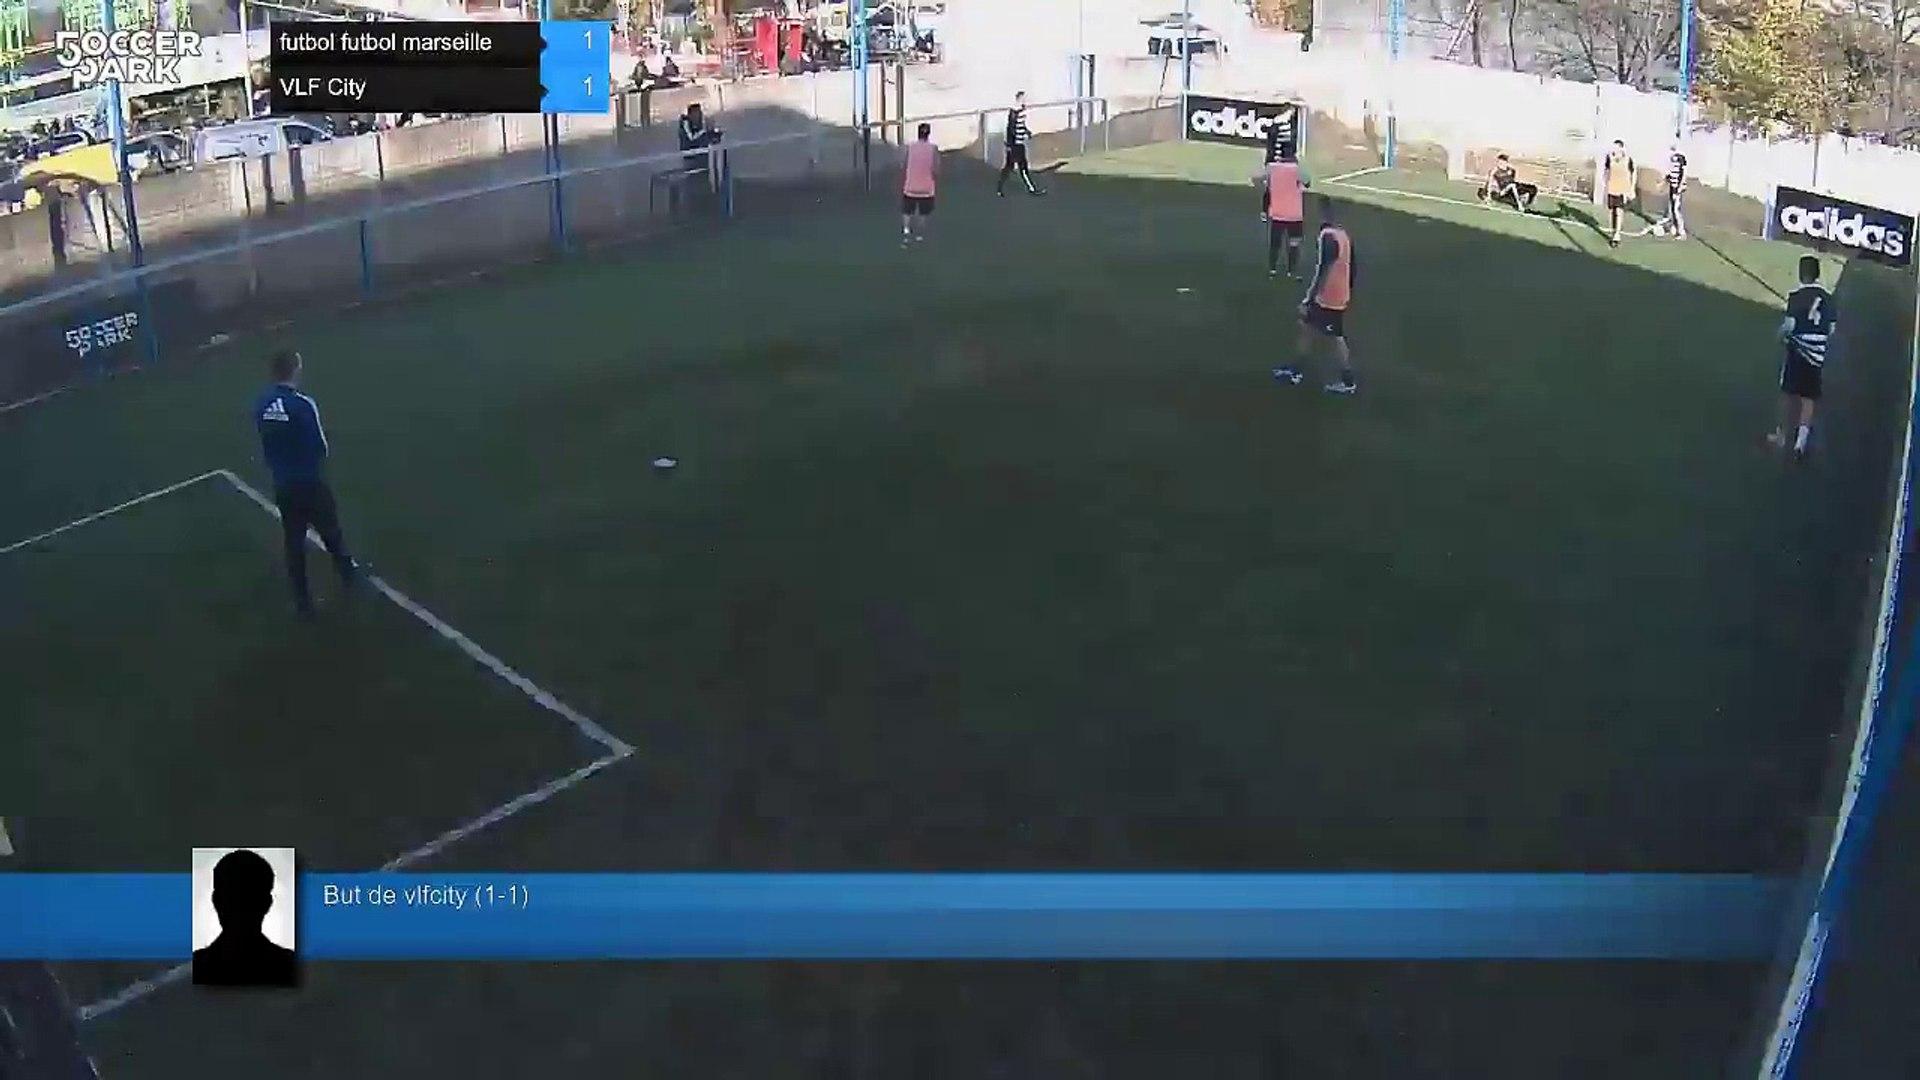 But de vlfcity (1-1) - futbol futbol marseille Vs VLF City - 12/12/15 11:22 - F5WC Finale regionale